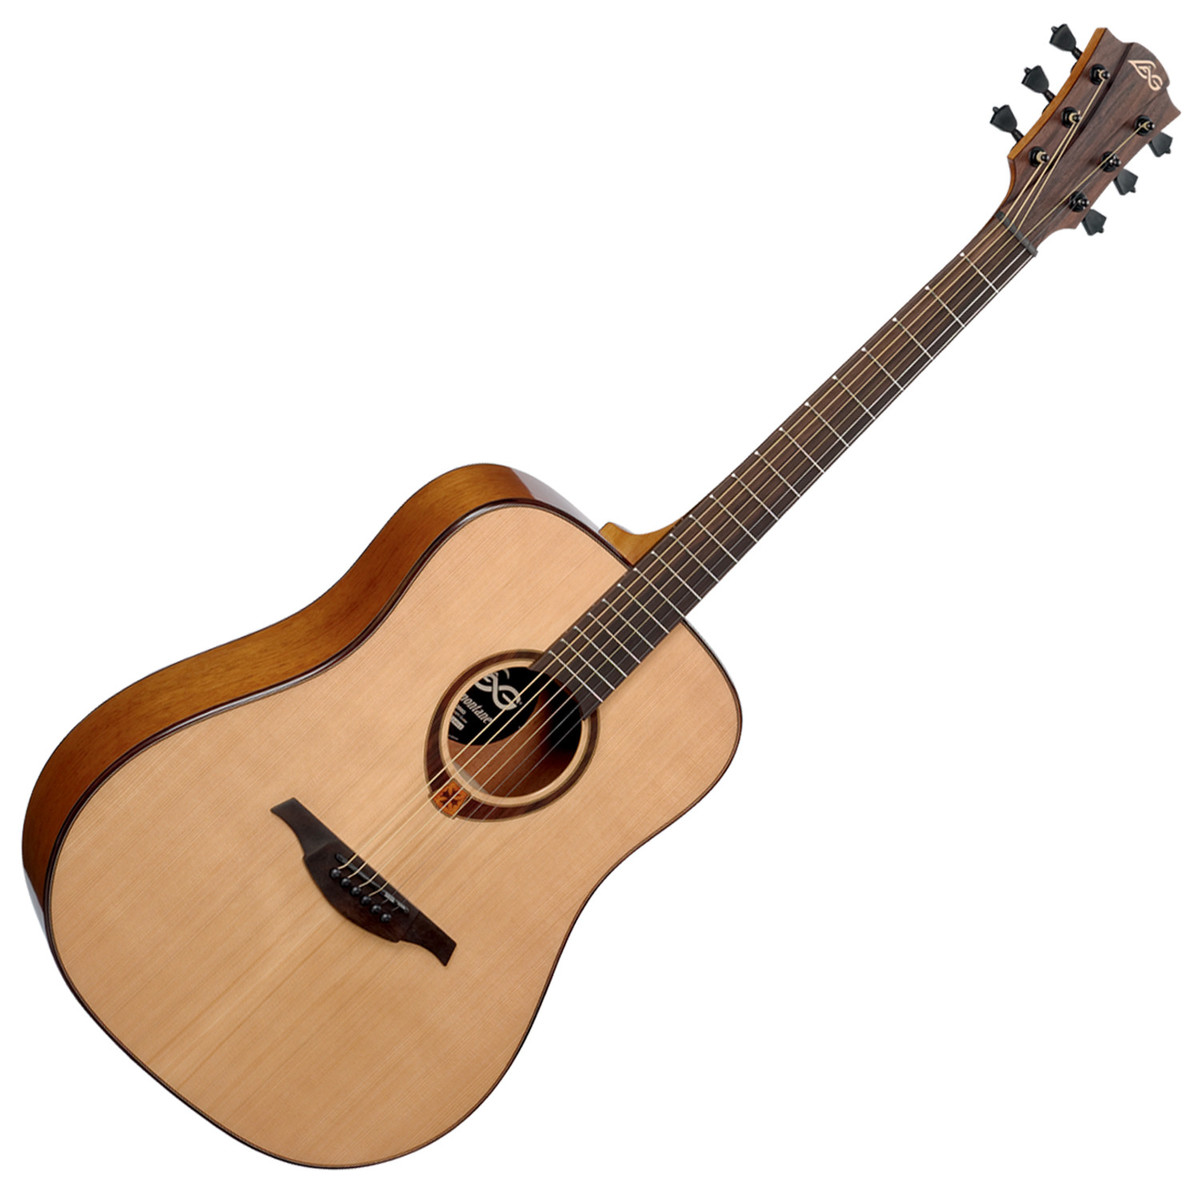 Lag Acoustic Guitar : lag t200d dreadnought acoustic guitar natural b stock at gear4music ~ Vivirlamusica.com Haus und Dekorationen